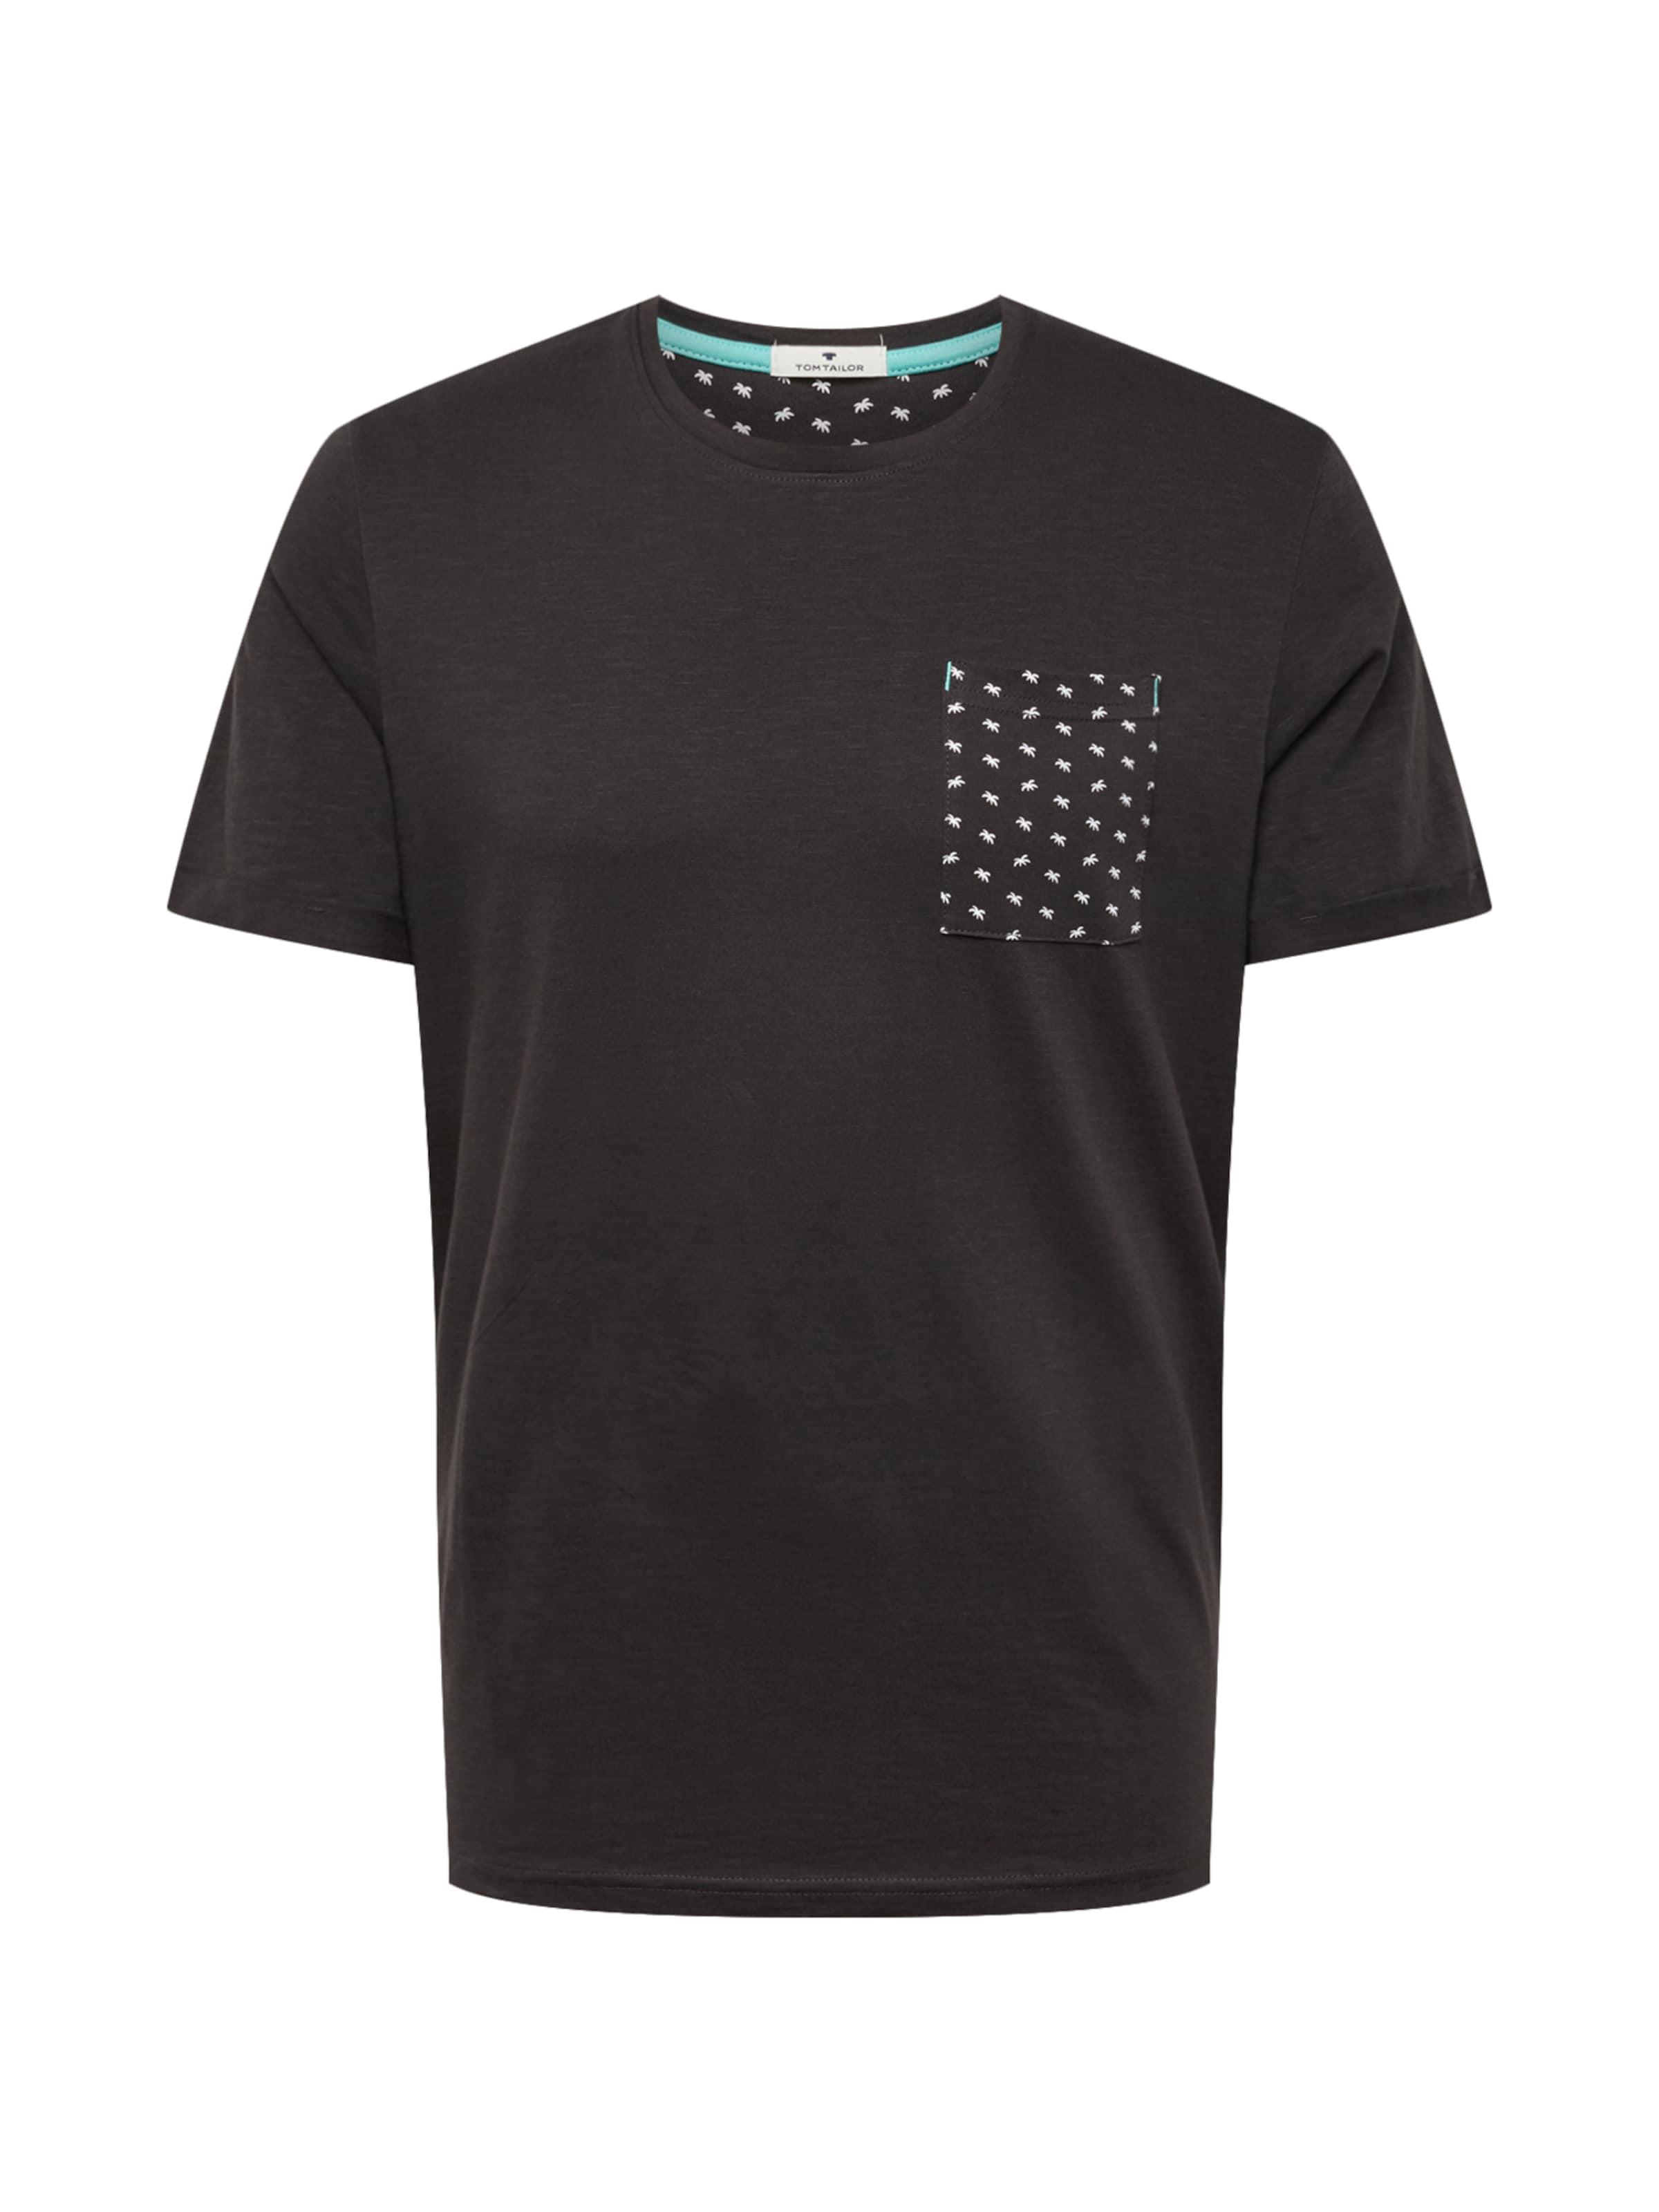 shirt Foncé Tailor En T Tom Gris DHEI9YeW2